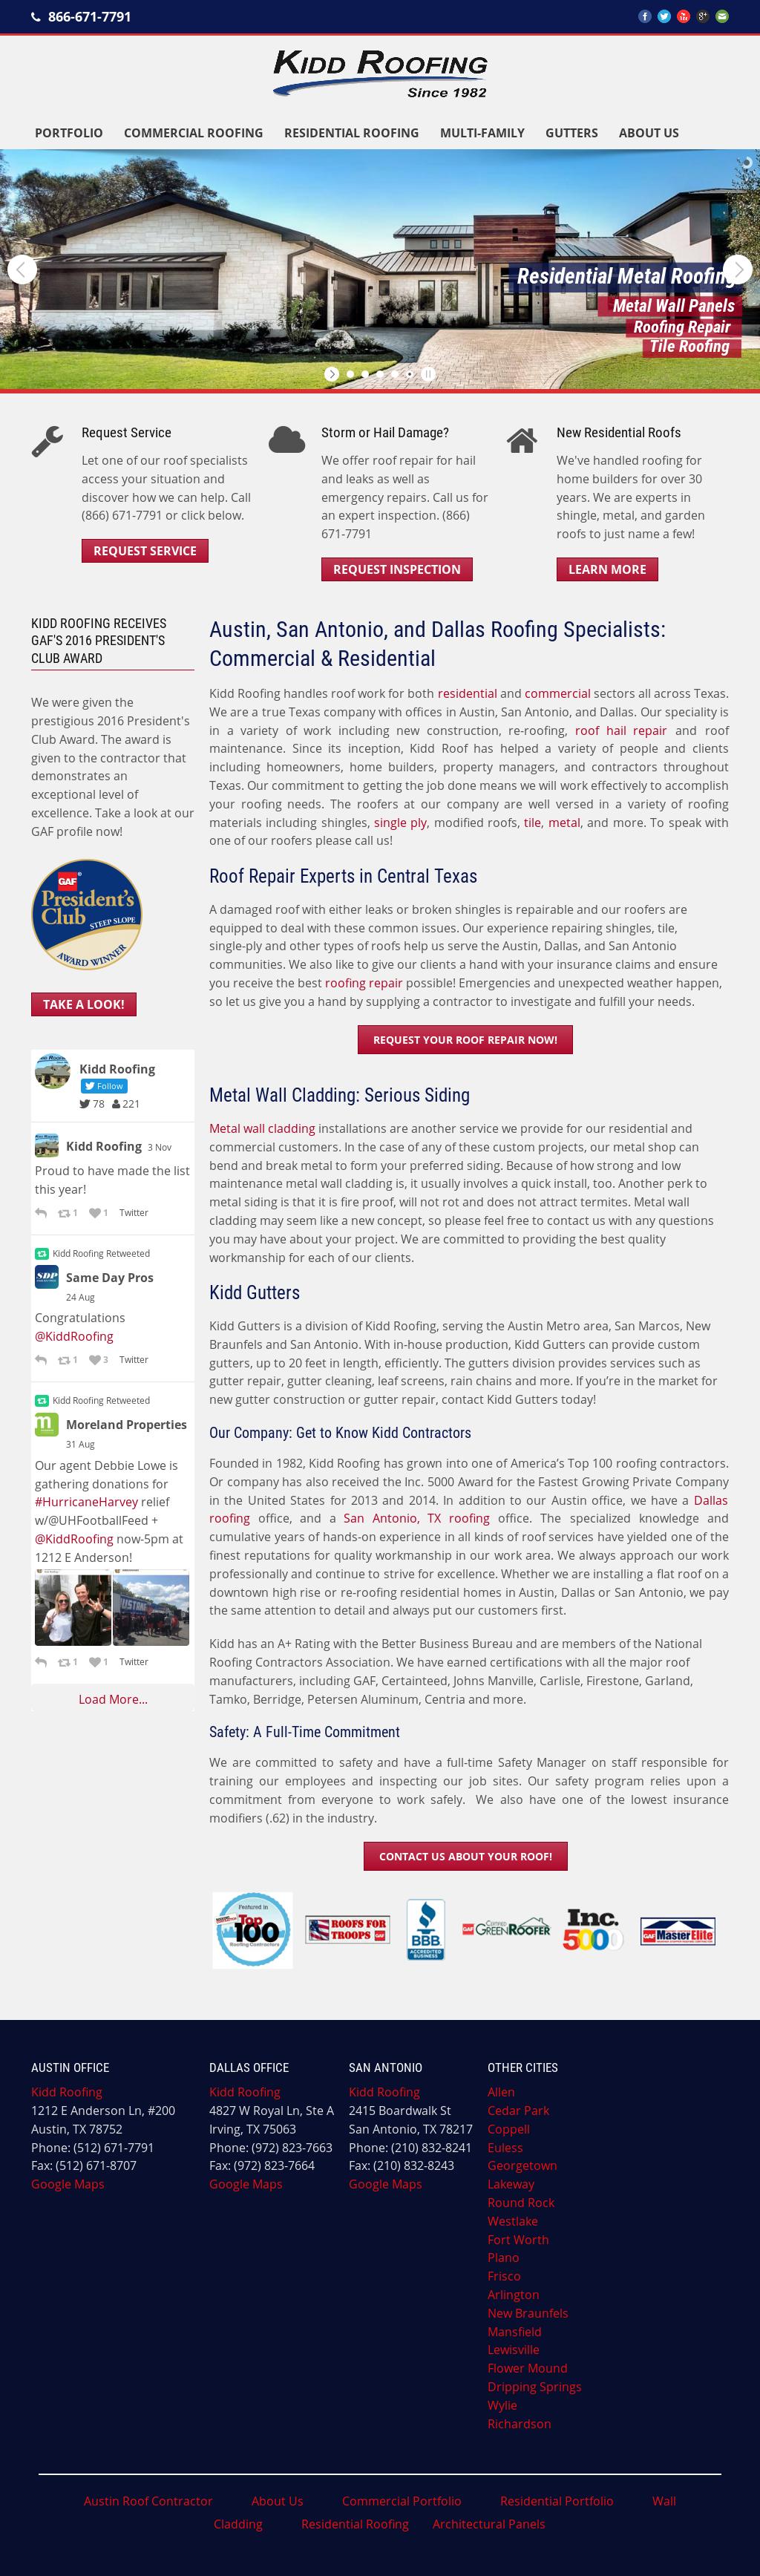 Kidd Roofing S Website Screenshot On Nov 2017